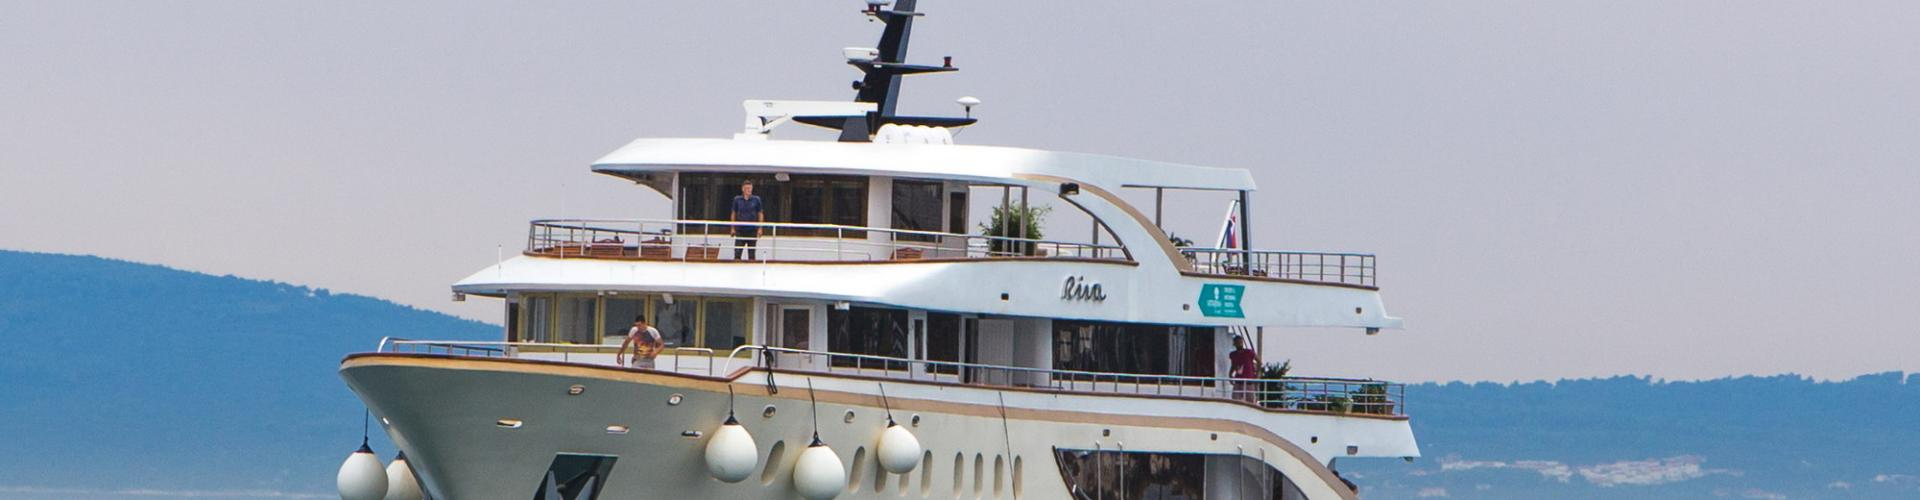 Deluxe Superior cruiser MV Riva- motor yacht